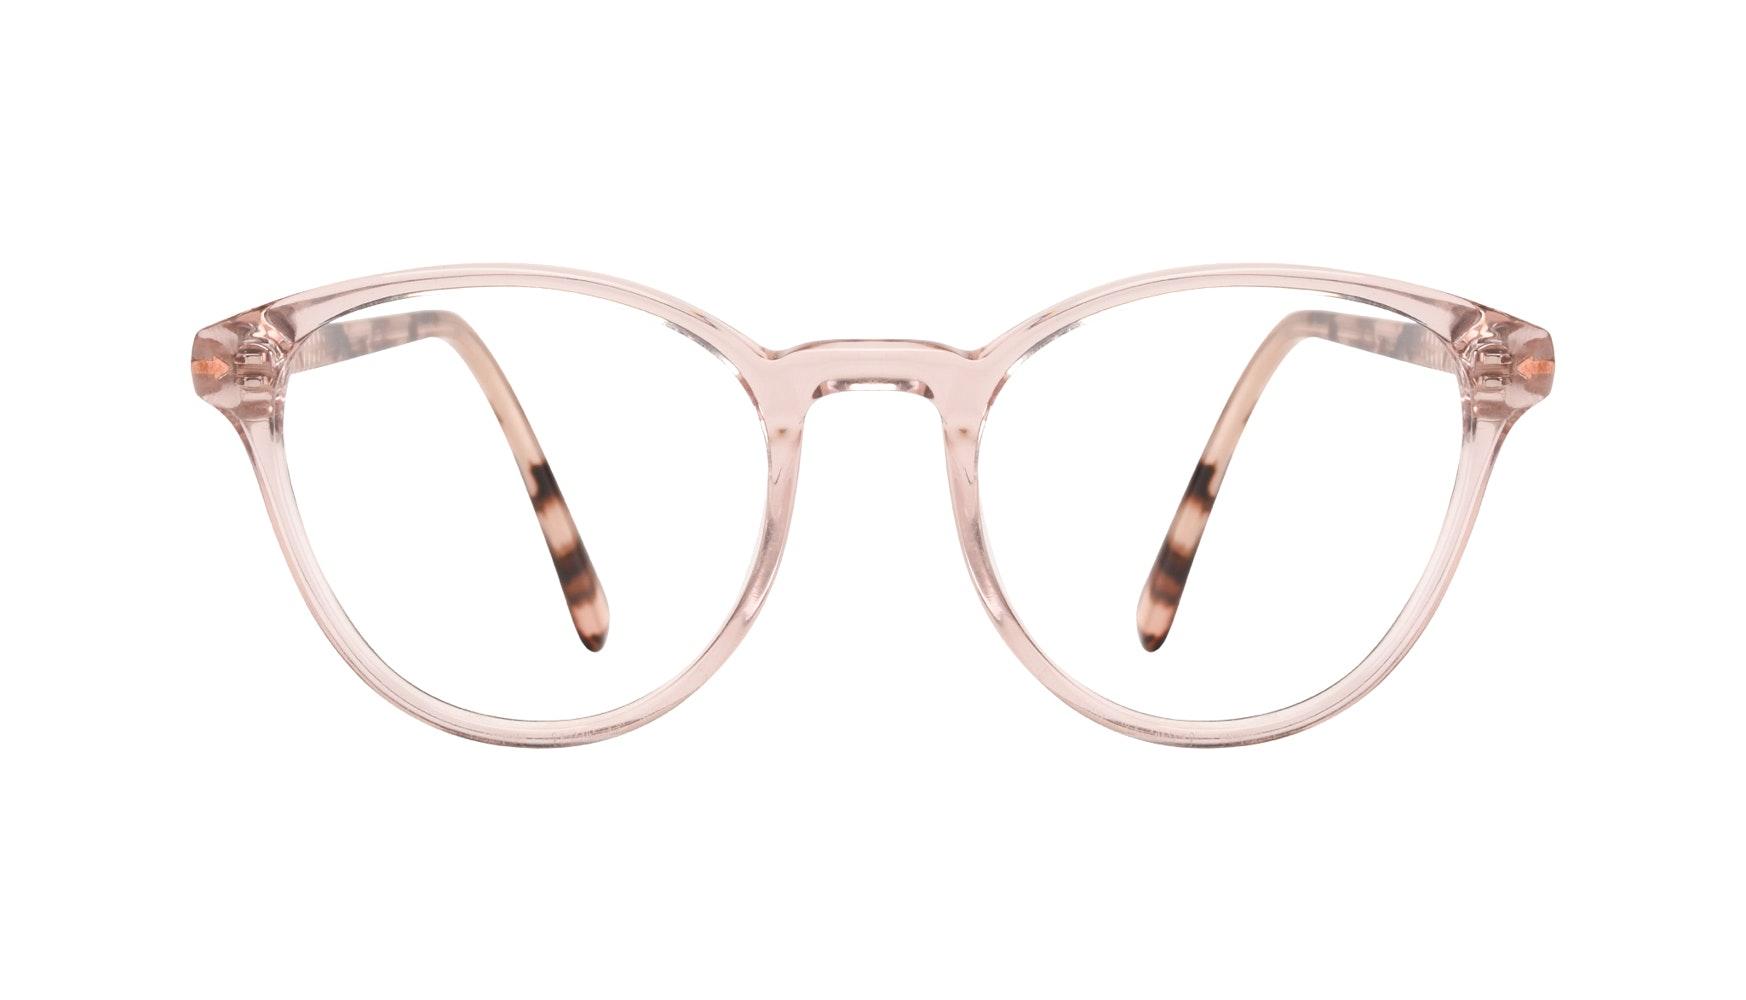 Affordable Fashion Glasses Round Eyeglasses Women London Blush Front